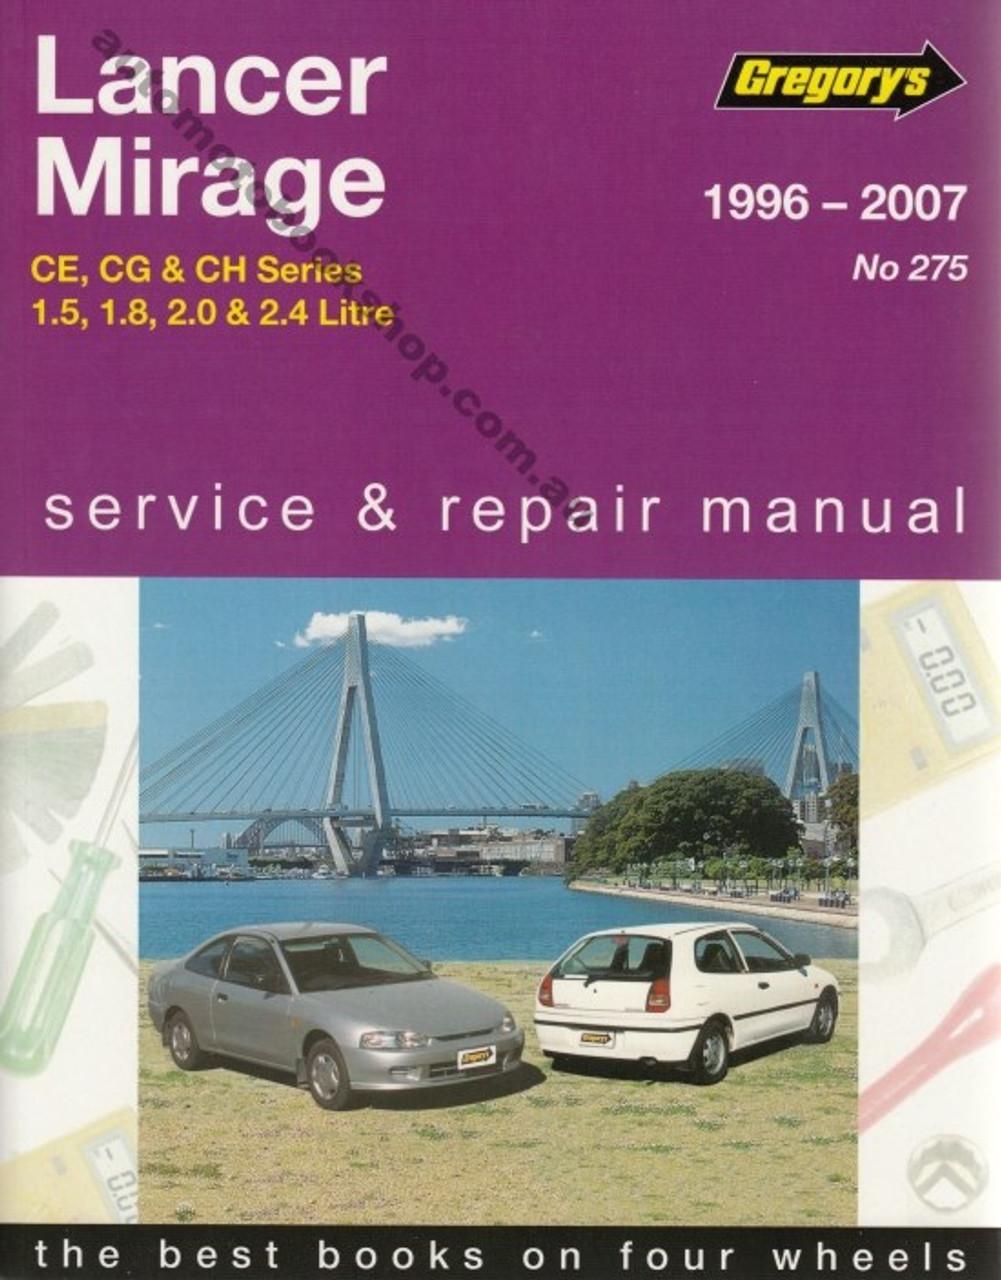 Mitsubishi lancer mirage ce cg ch 1996 2007 workshop manual mitsubishi lancer mirage ce cg ch 1996 2007 repair service manual publicscrutiny Gallery